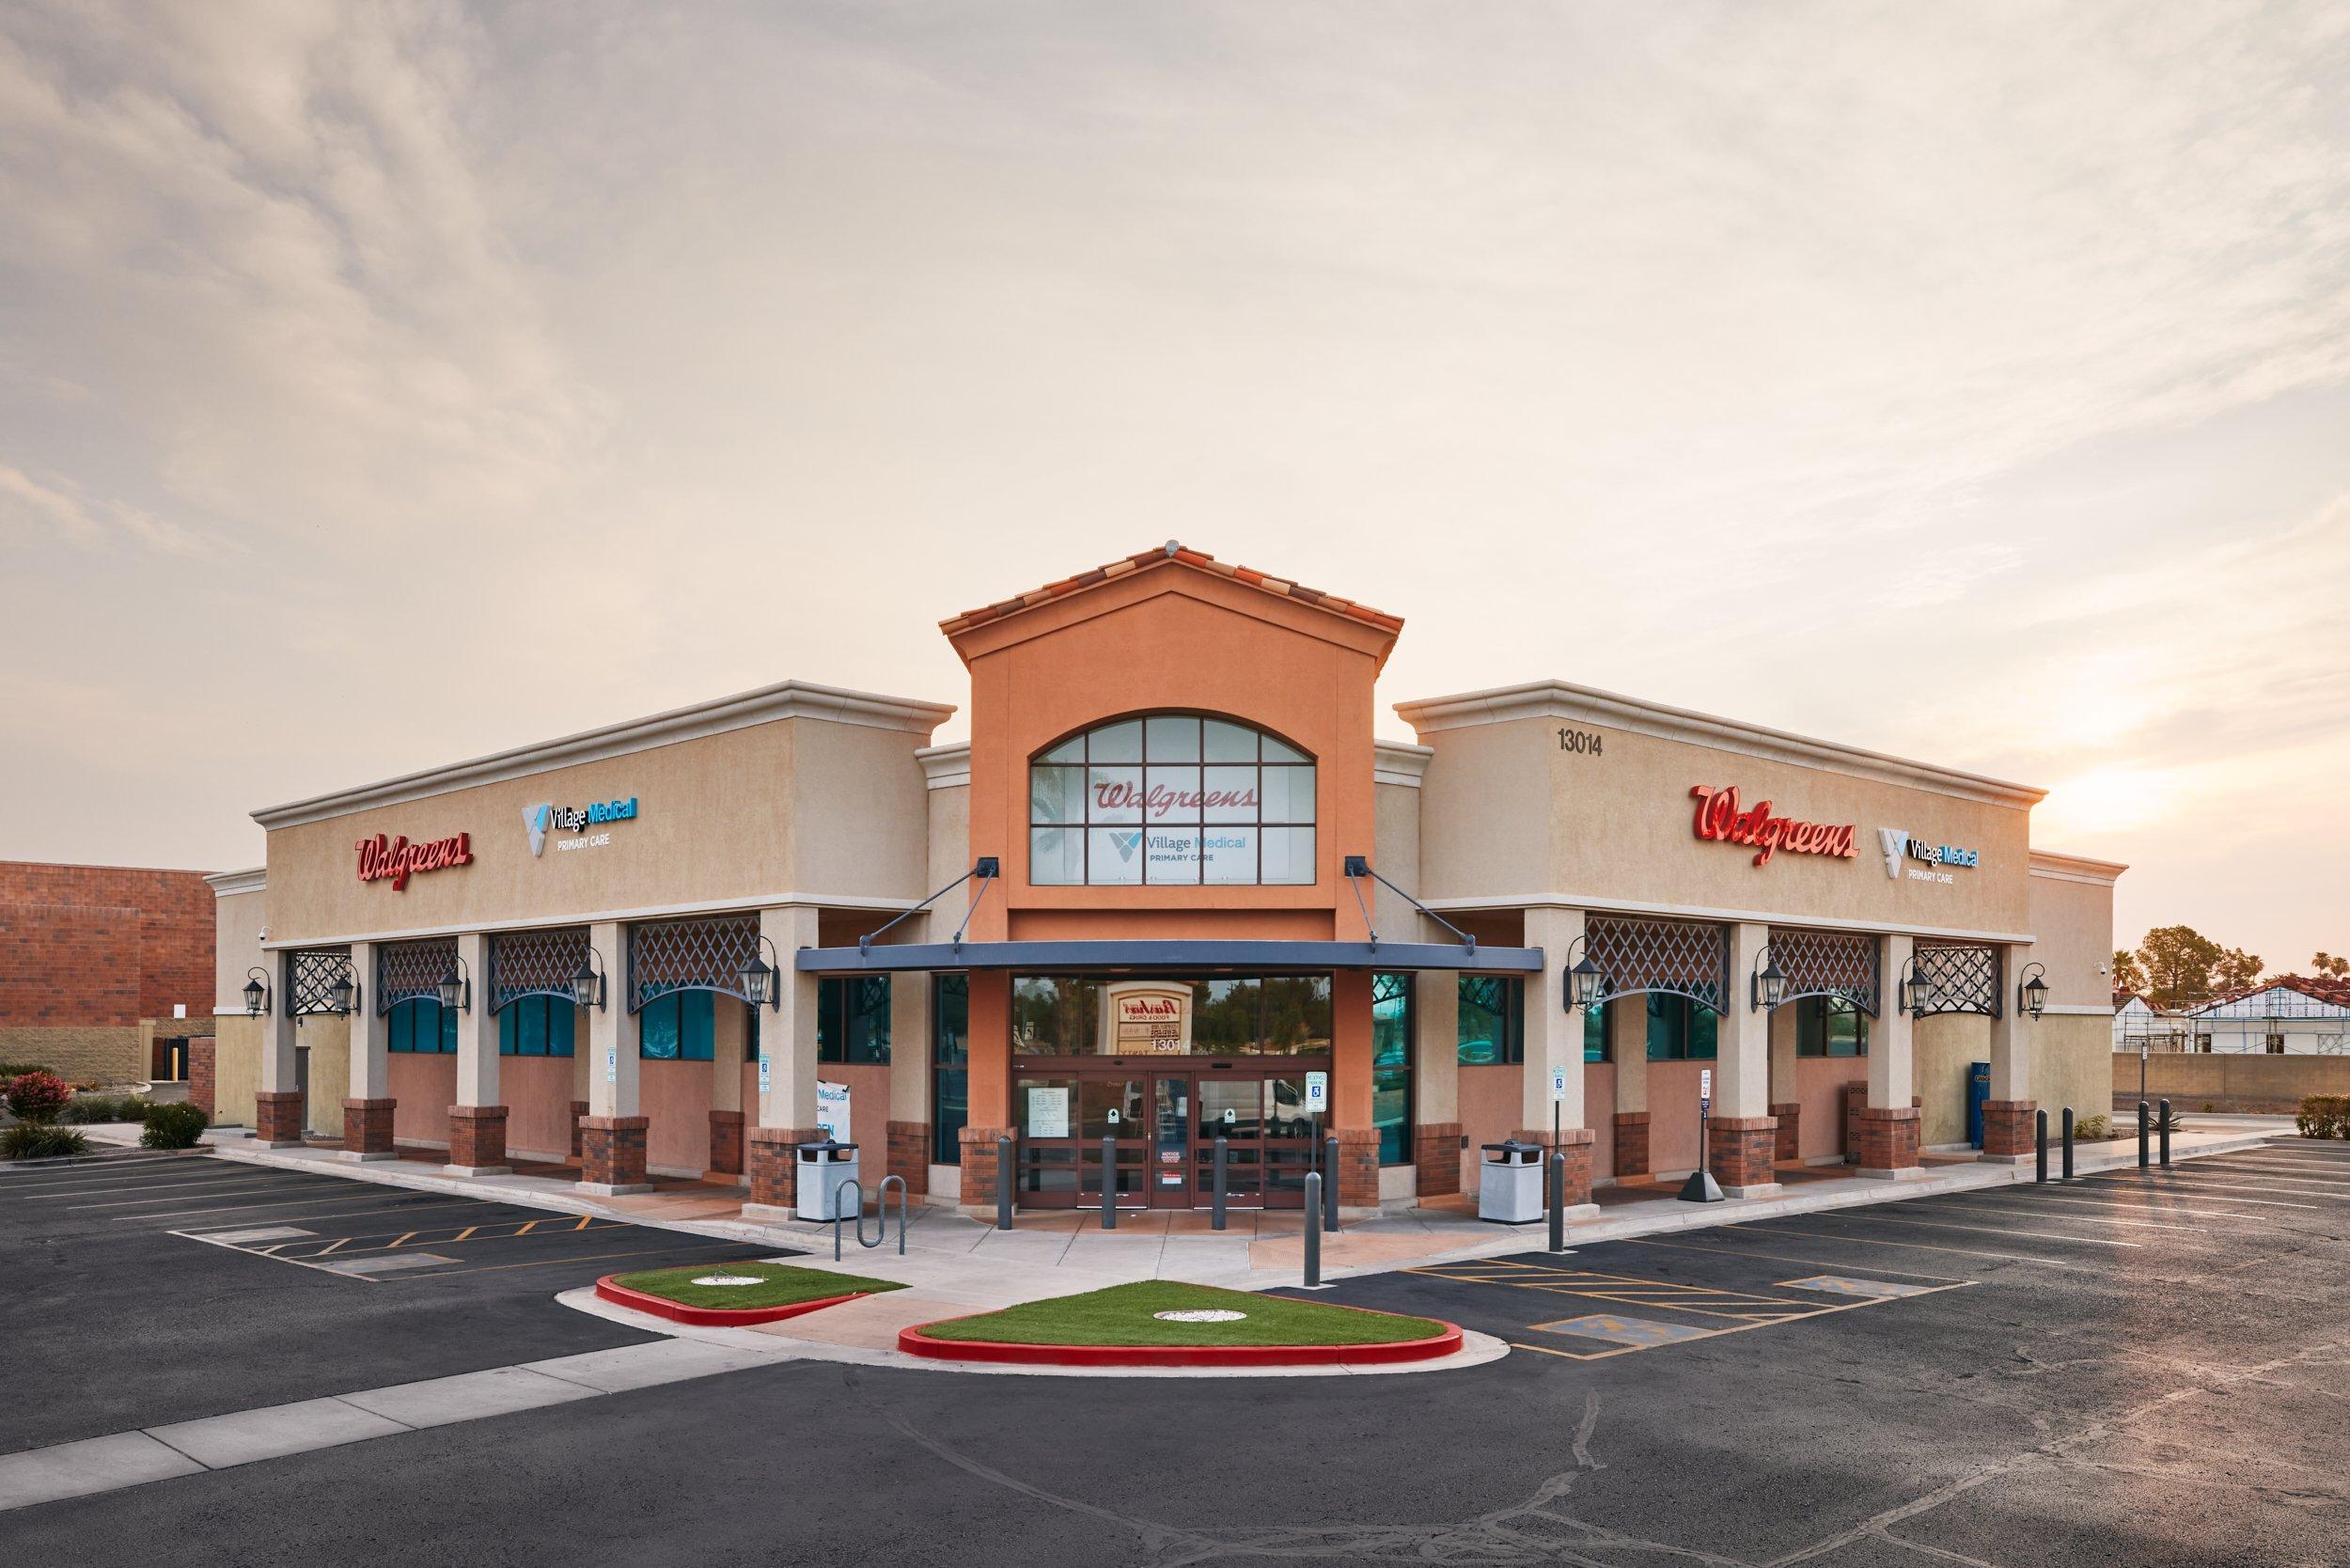 Village Medical at Walgreens - 13014 W. Camelback Rd. Suite 102 Litchfield Park, AZ 85340